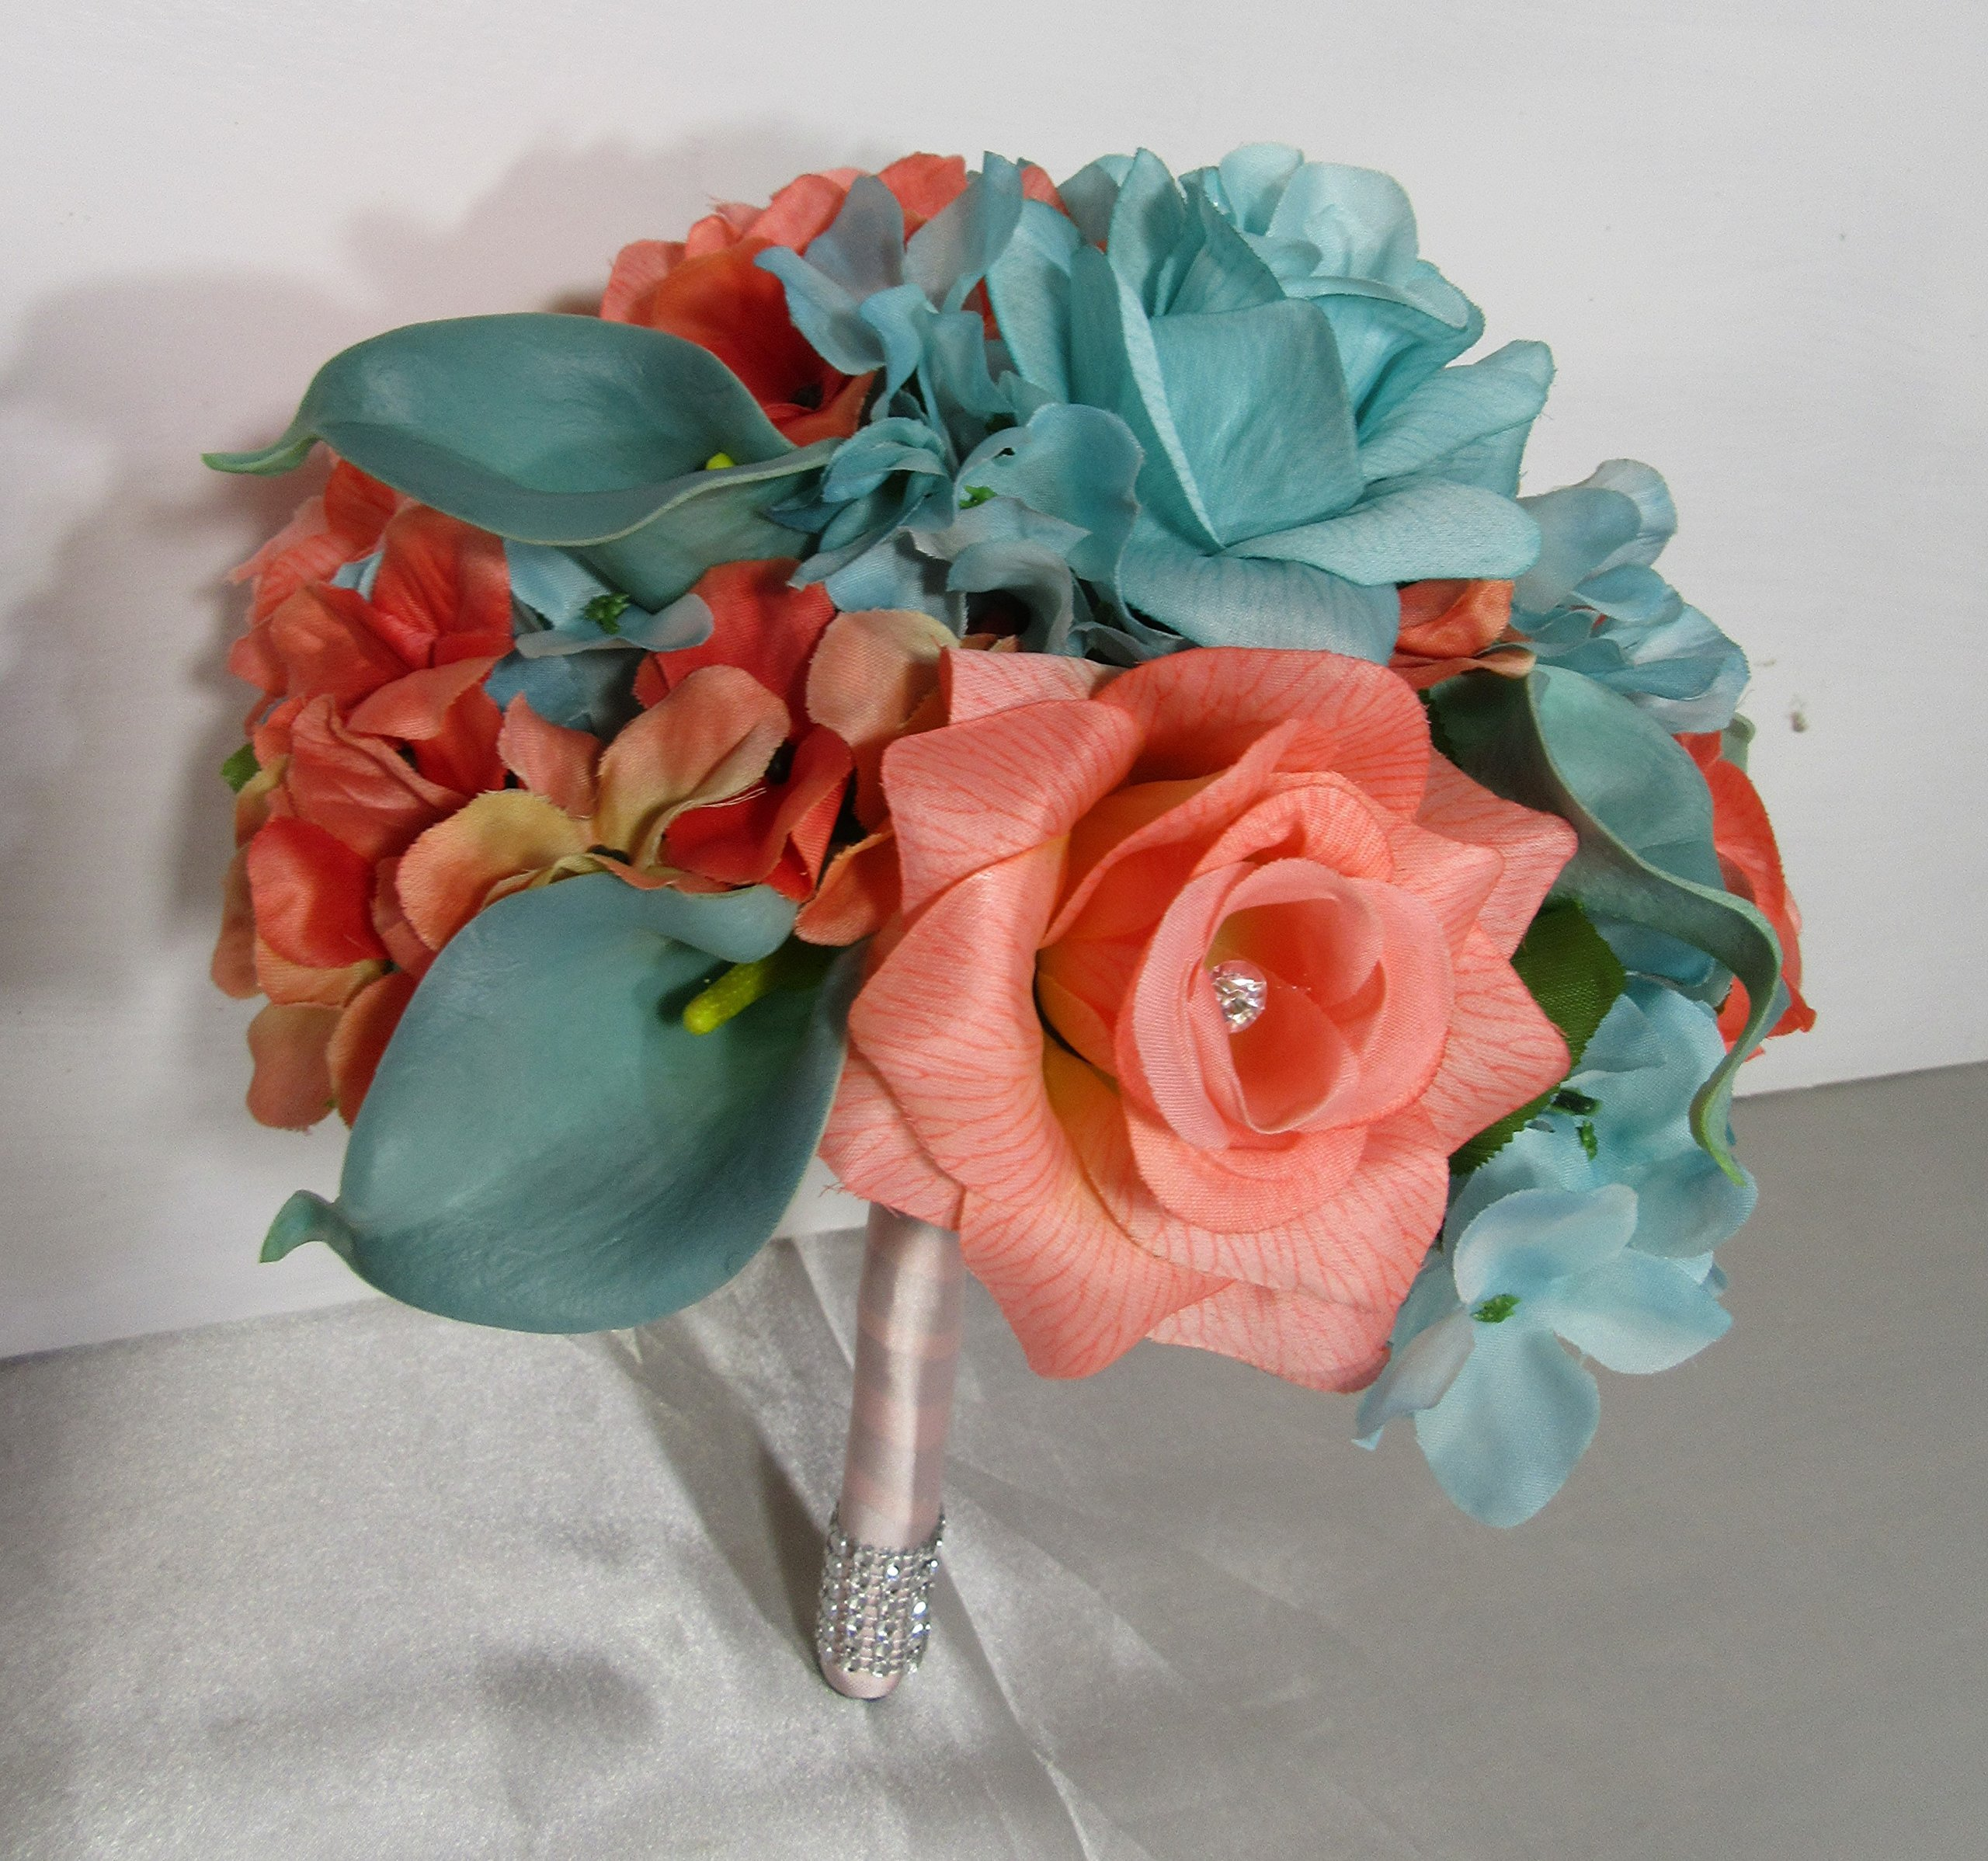 Light Pink Rhinestone Rose Calla Lily Bridal Wedding Bouquet /& Boutonniere